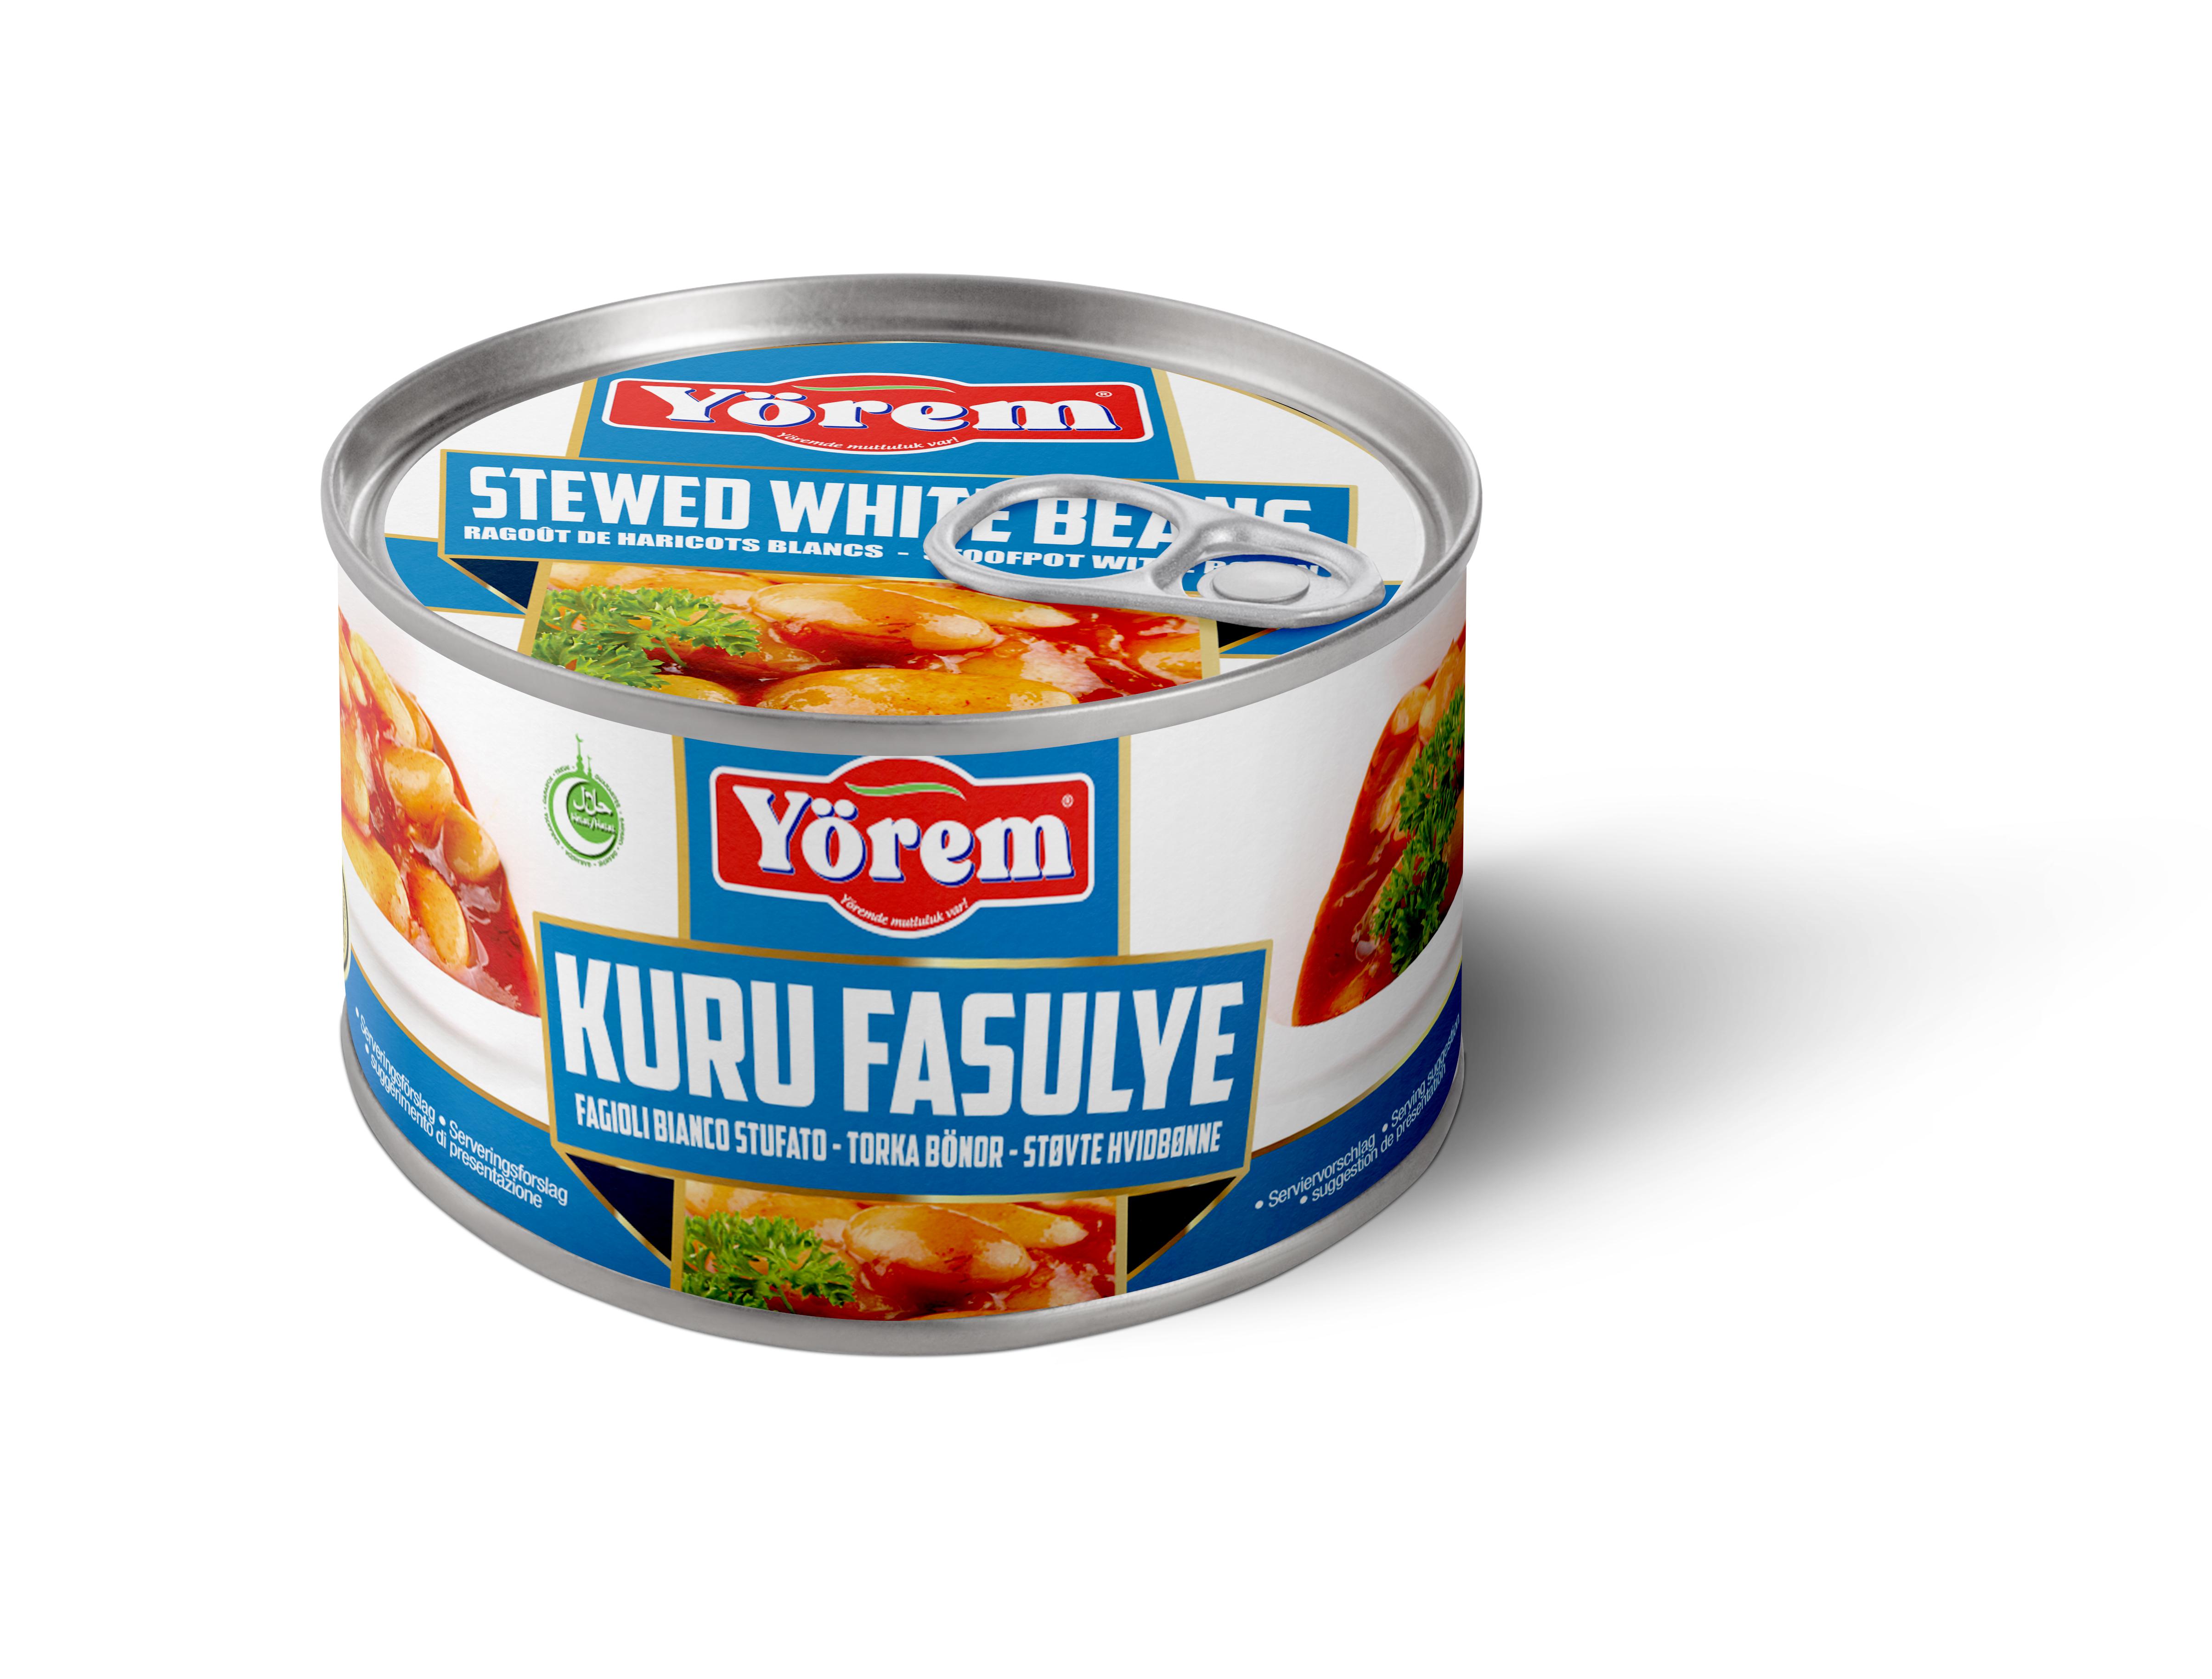 YOREM KURU FASULYE PILAKI TNK 12x400G (haricots blancs en sauce pilaki)